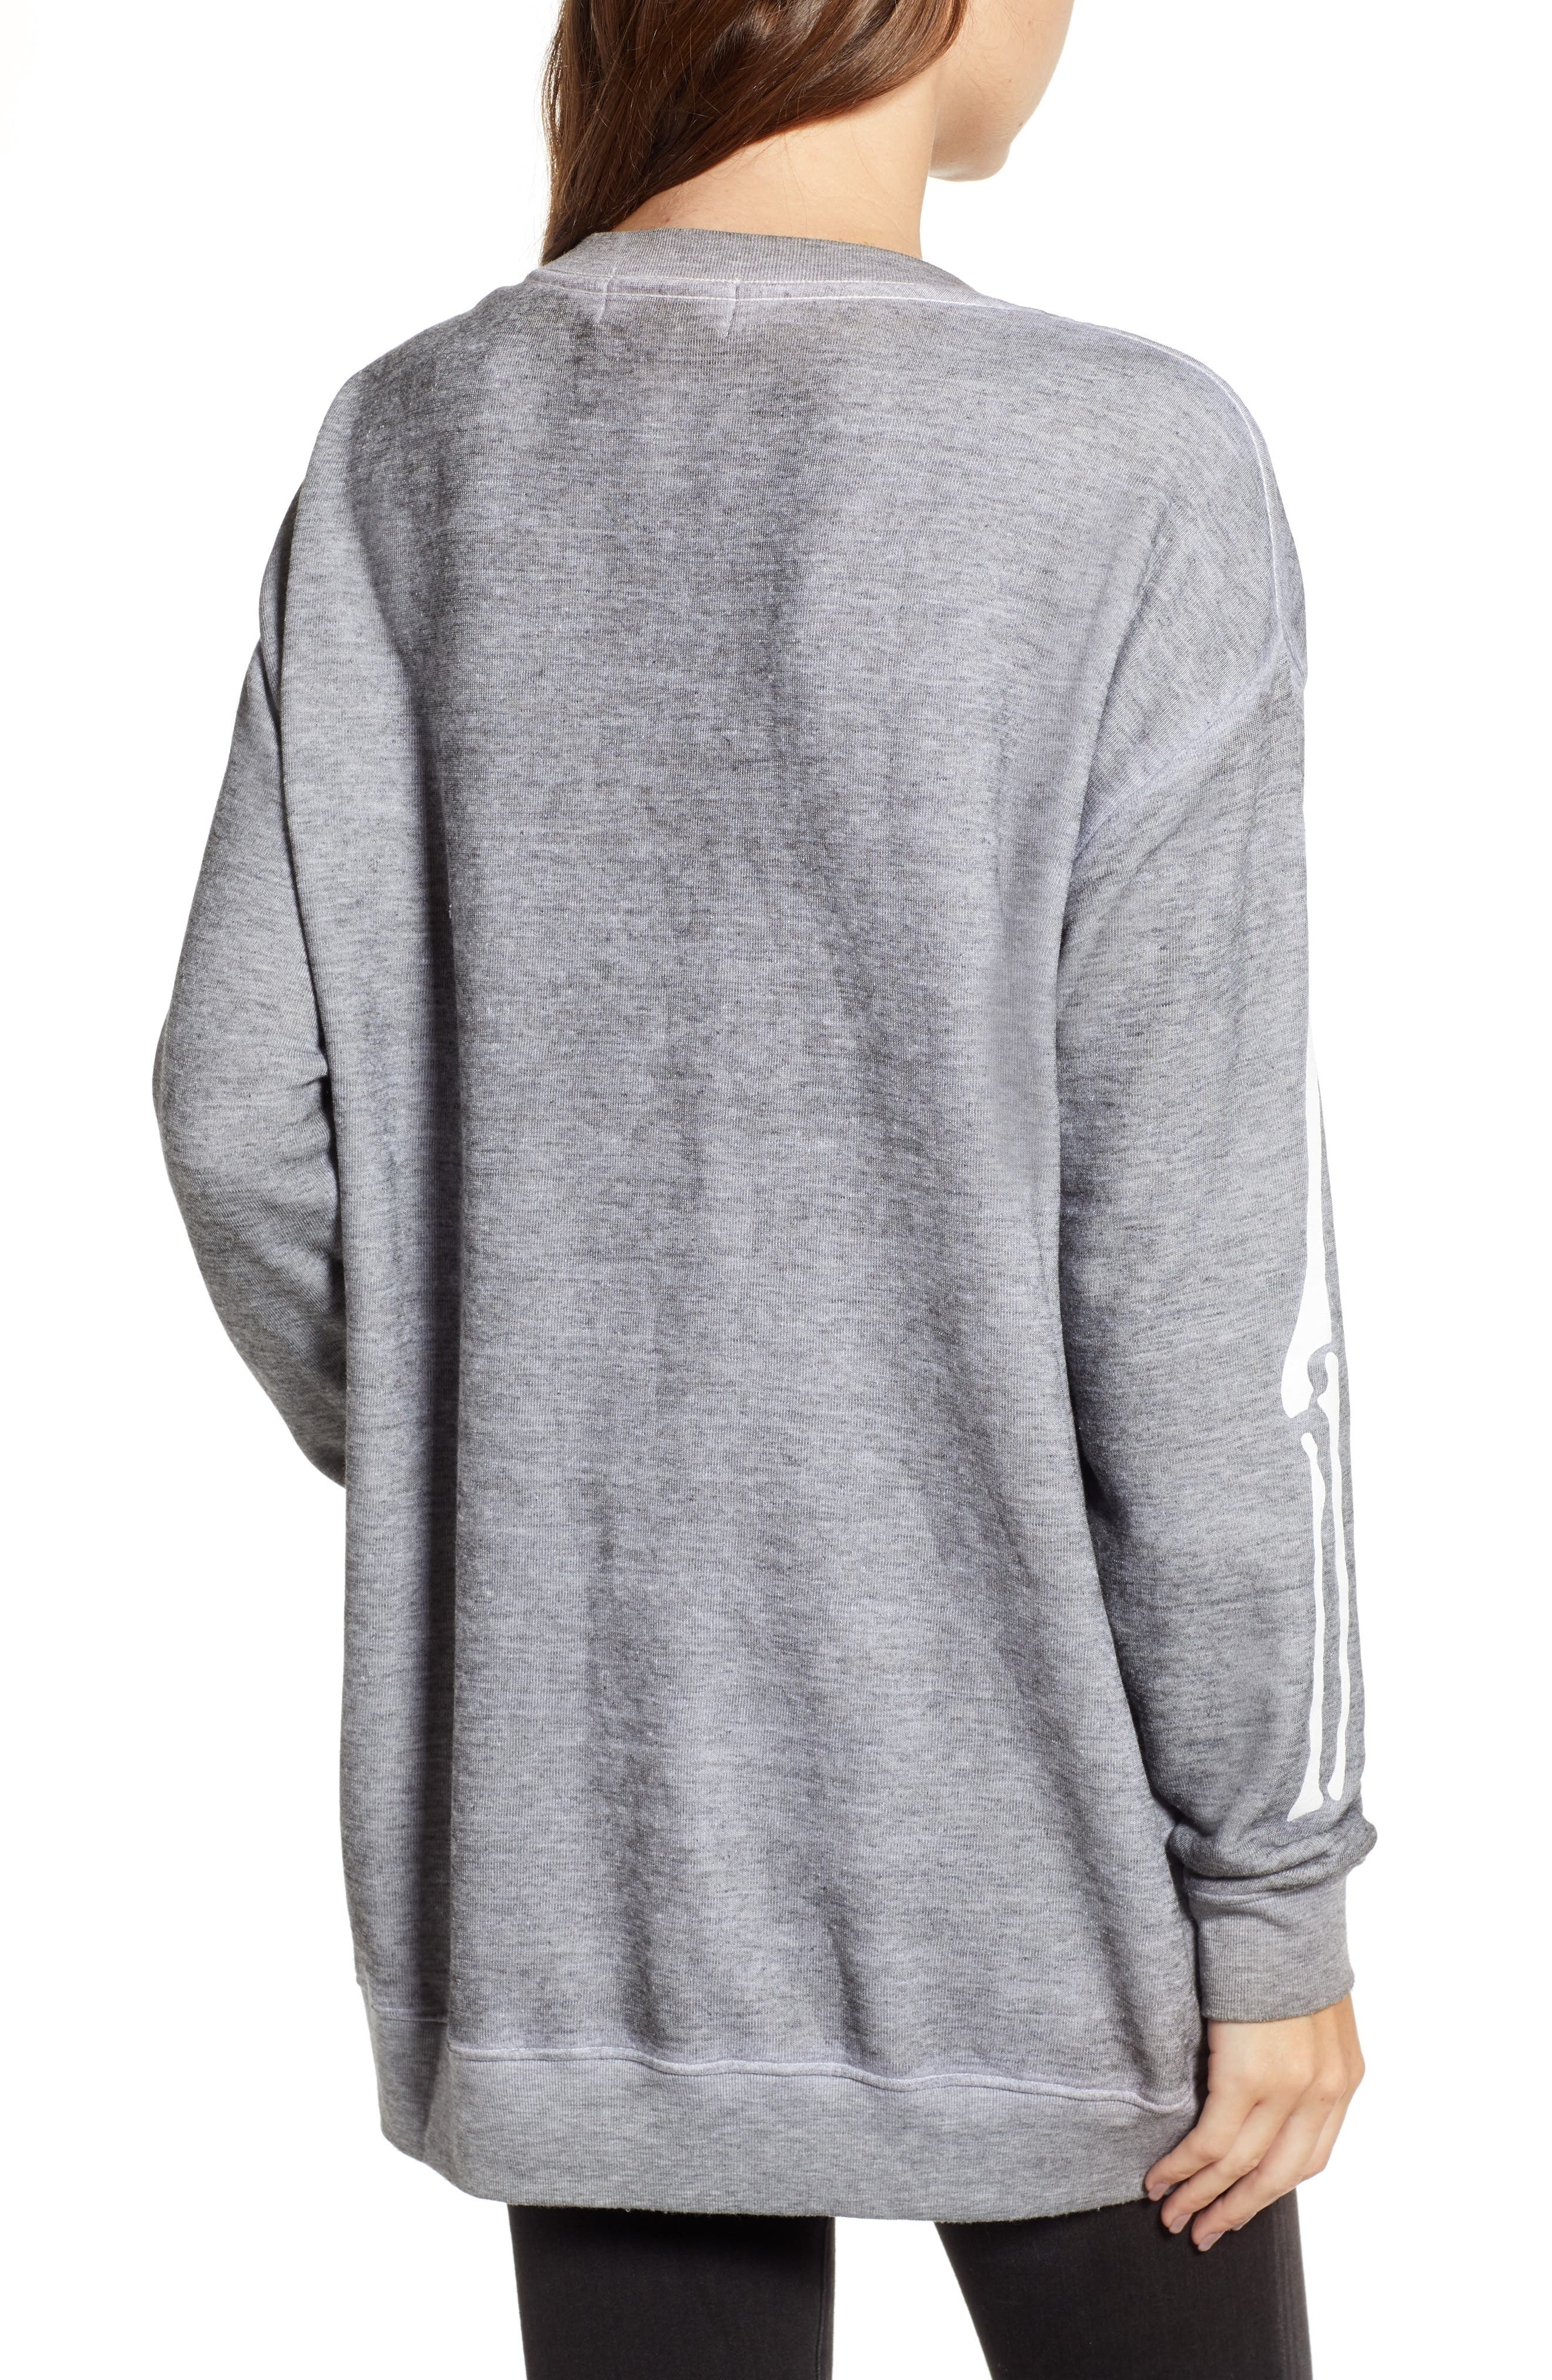 X-Ray Vision Road Trip Sweatshirt,                             Alternate thumbnail 2, color,                             020